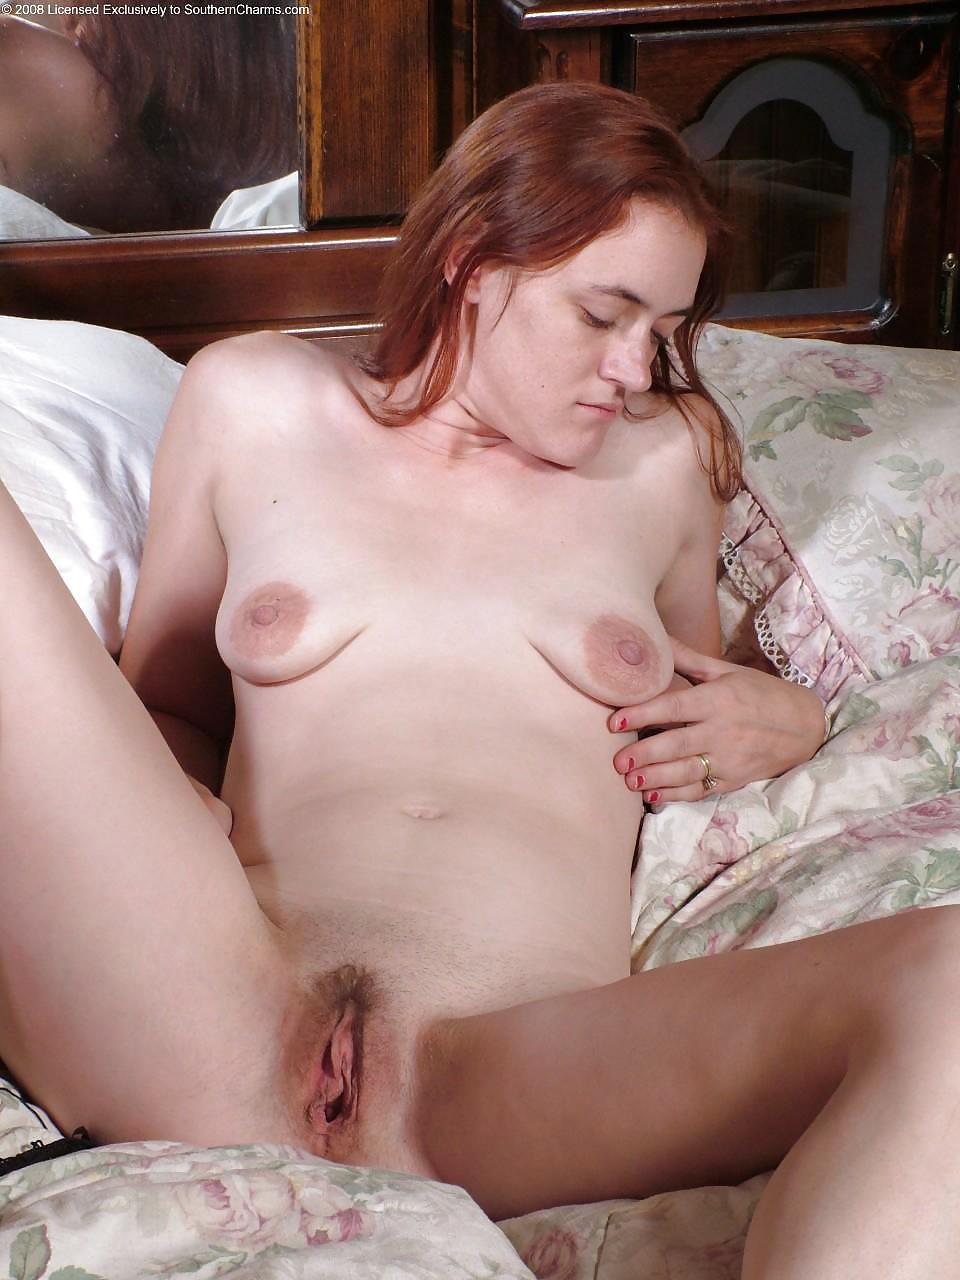 Little Saggy Tits